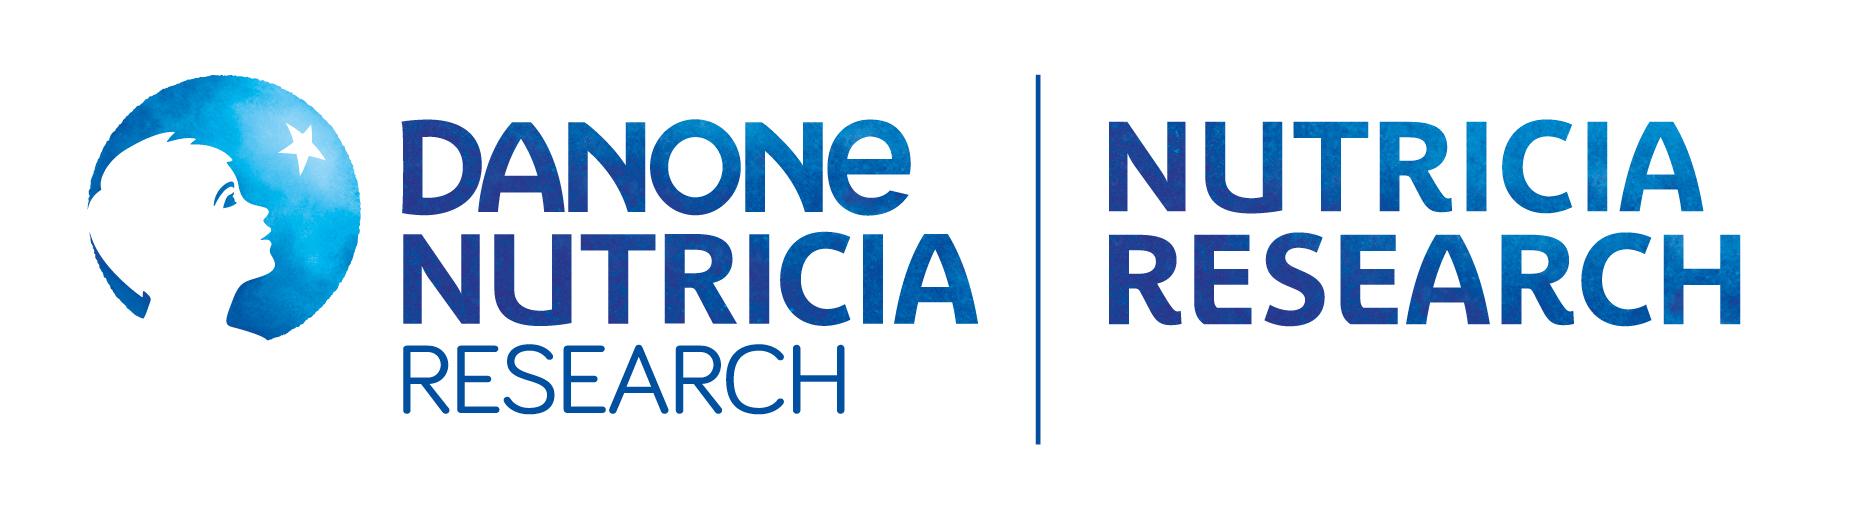 Danone-Nutricia-Research2.jpg